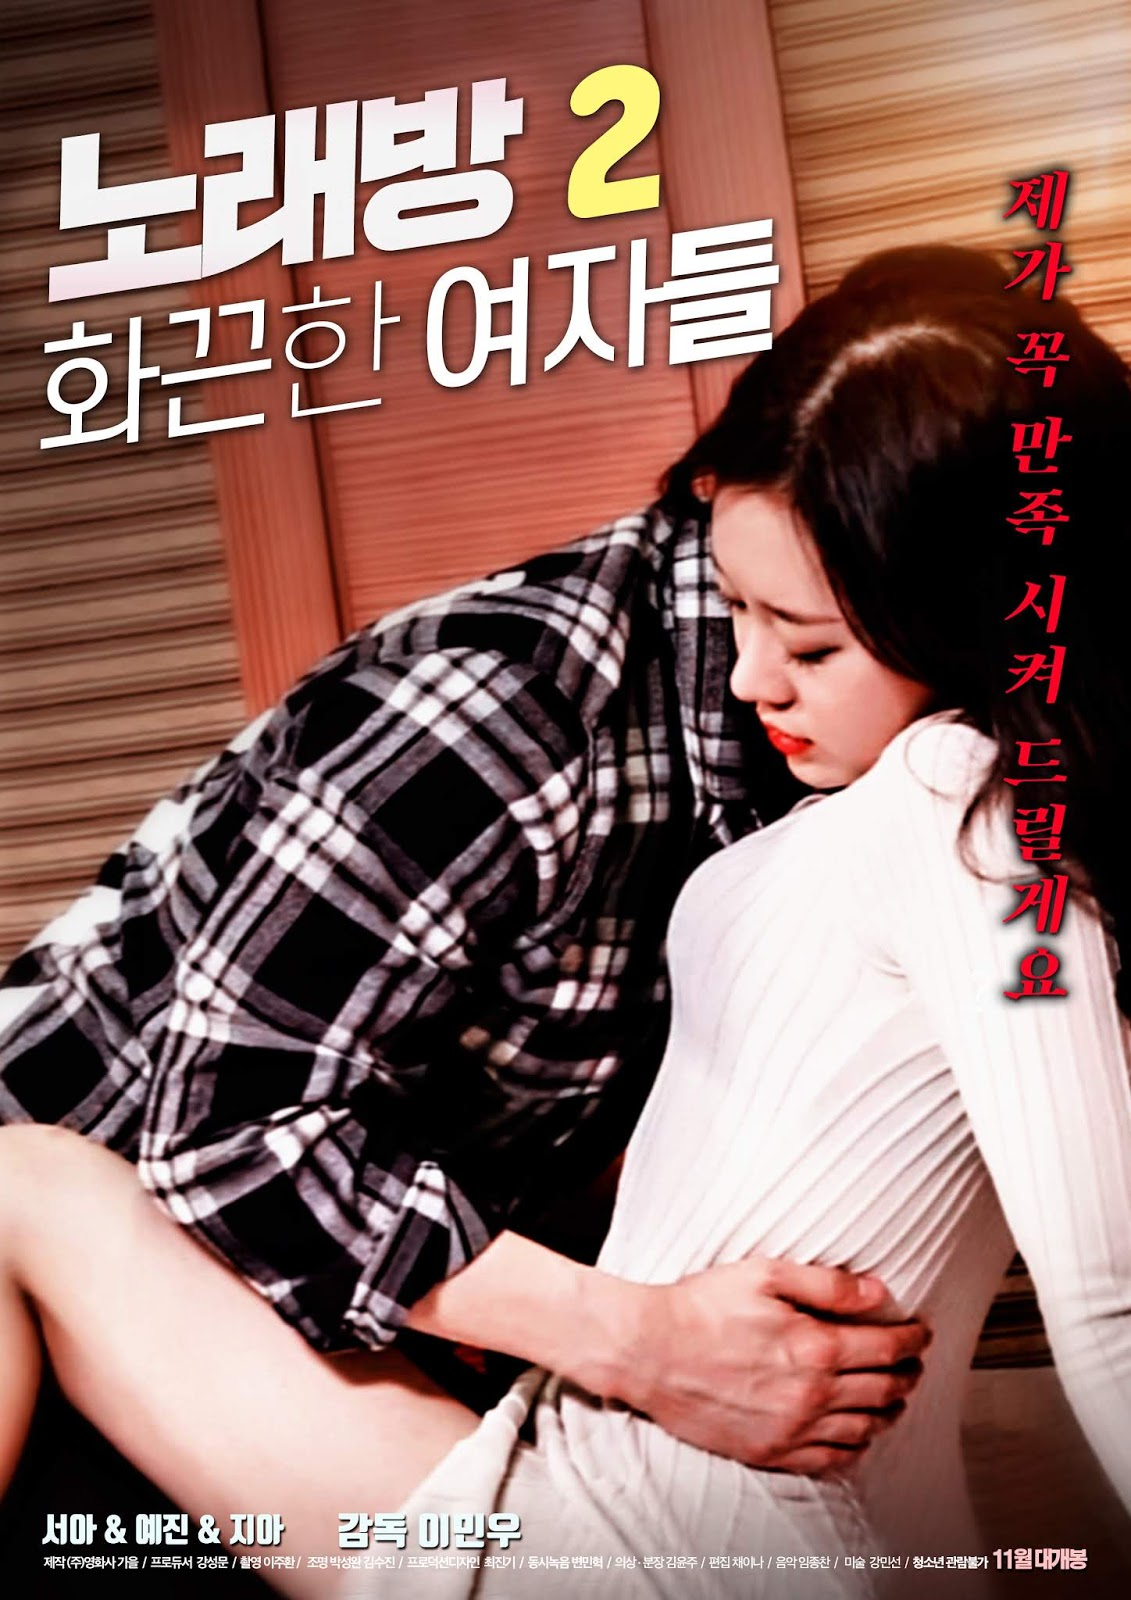 Noraebang Hot Women 2 Full Korea 18+ Adult Movie Online Free